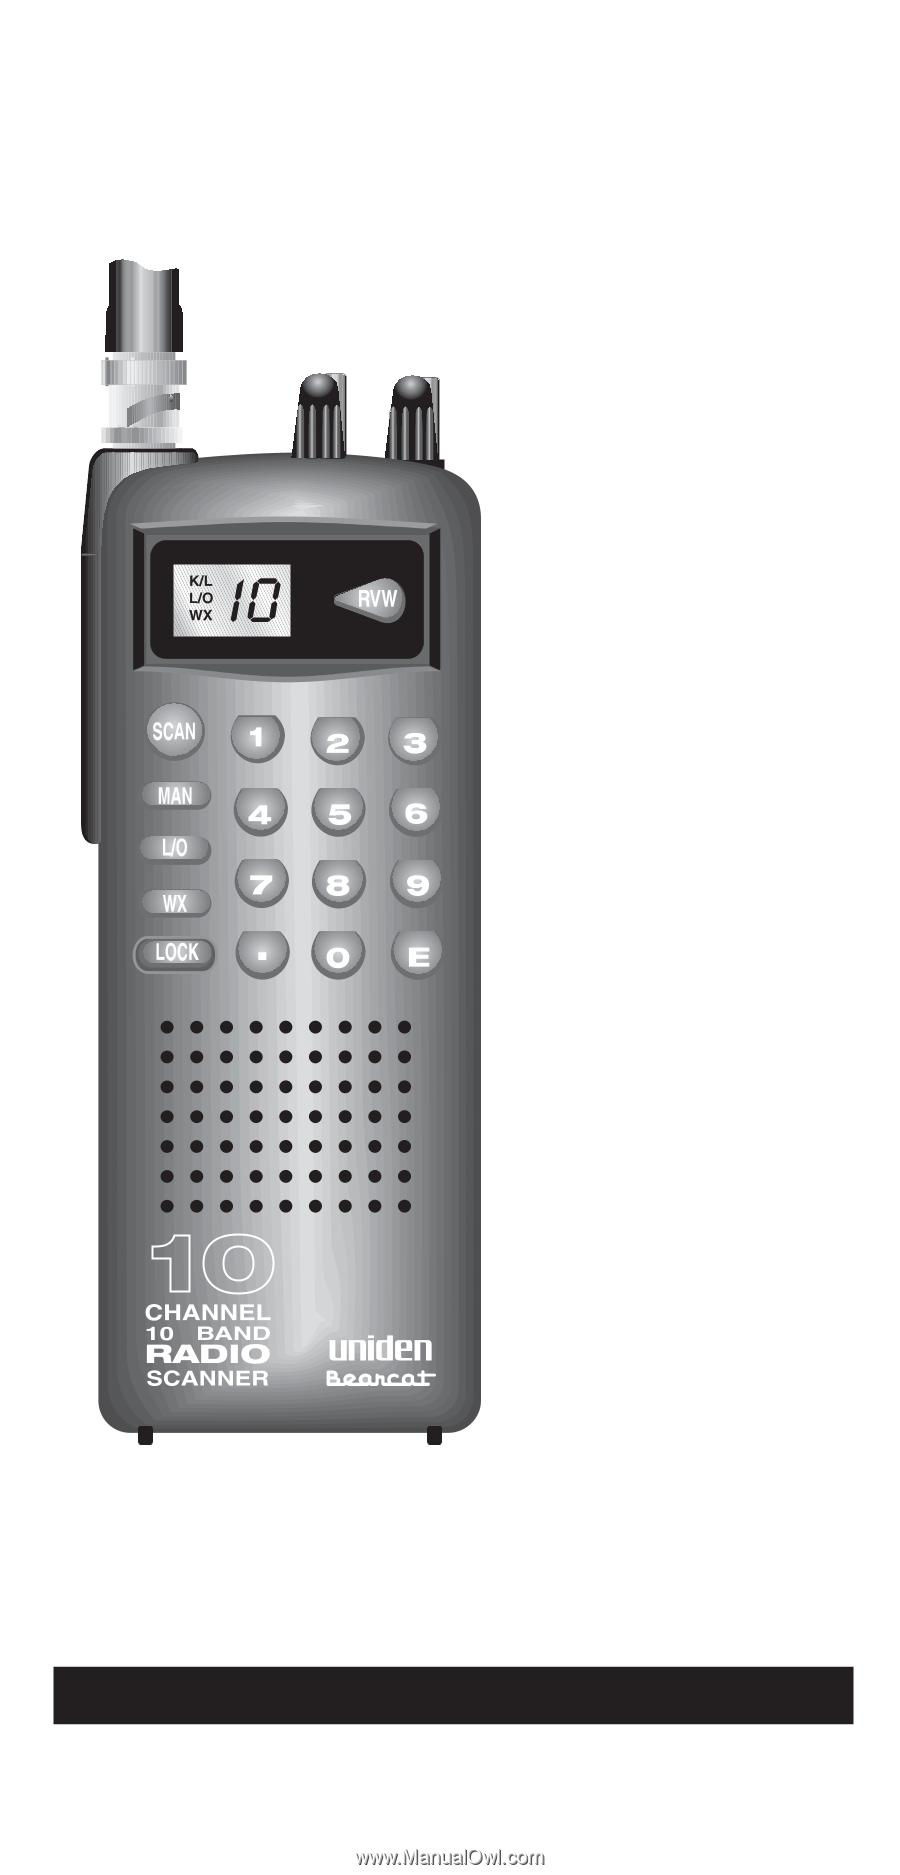 uniden bc60xlt english owners manual rh manualowl com BC60XLT Uniden Handheld Scanner Uniden Bearcat BC60XLT Instruction Manual